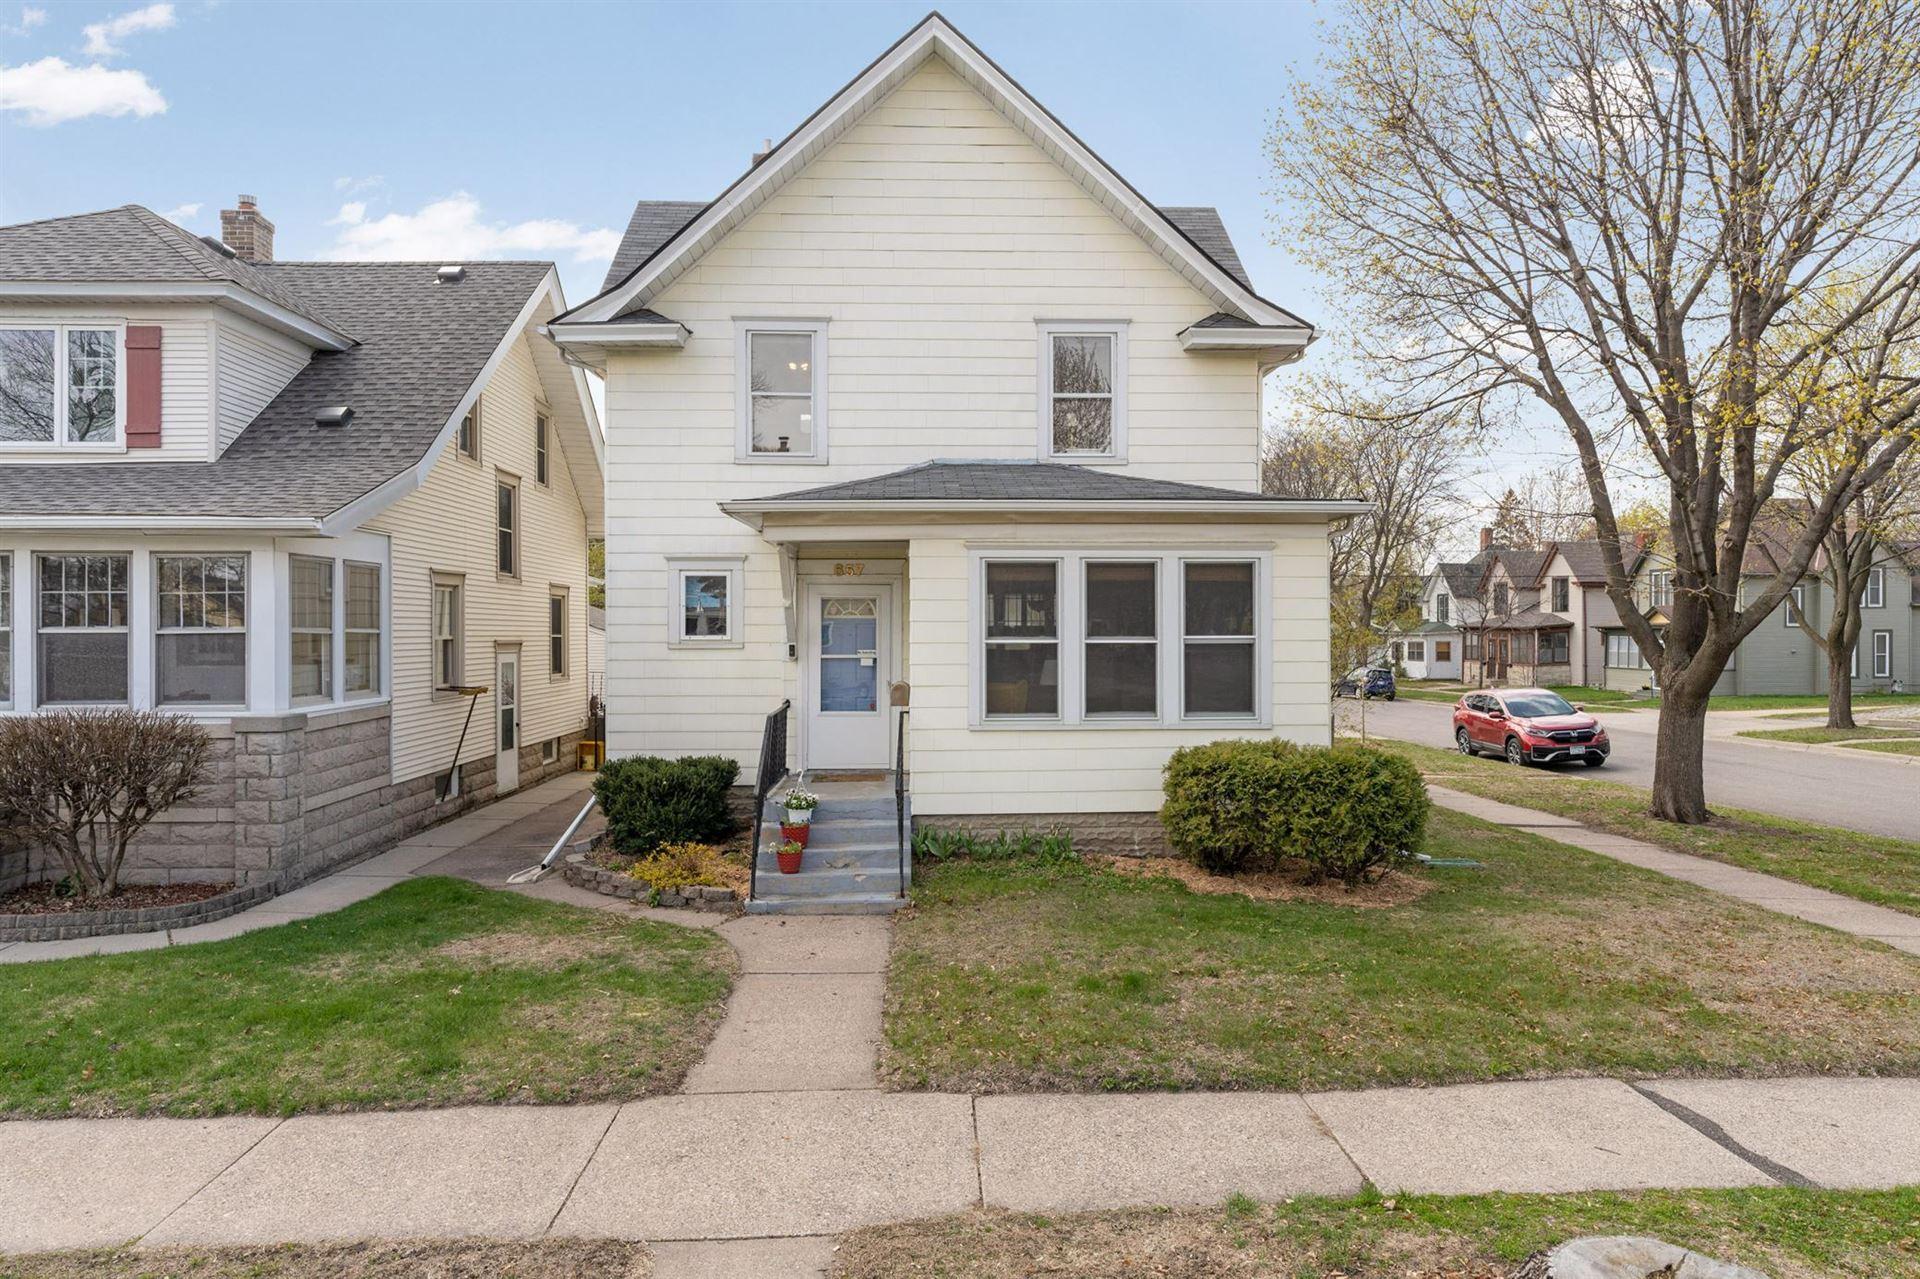 Photo of 657 Simpson Street, Saint Paul, MN 55104 (MLS # 5743150)